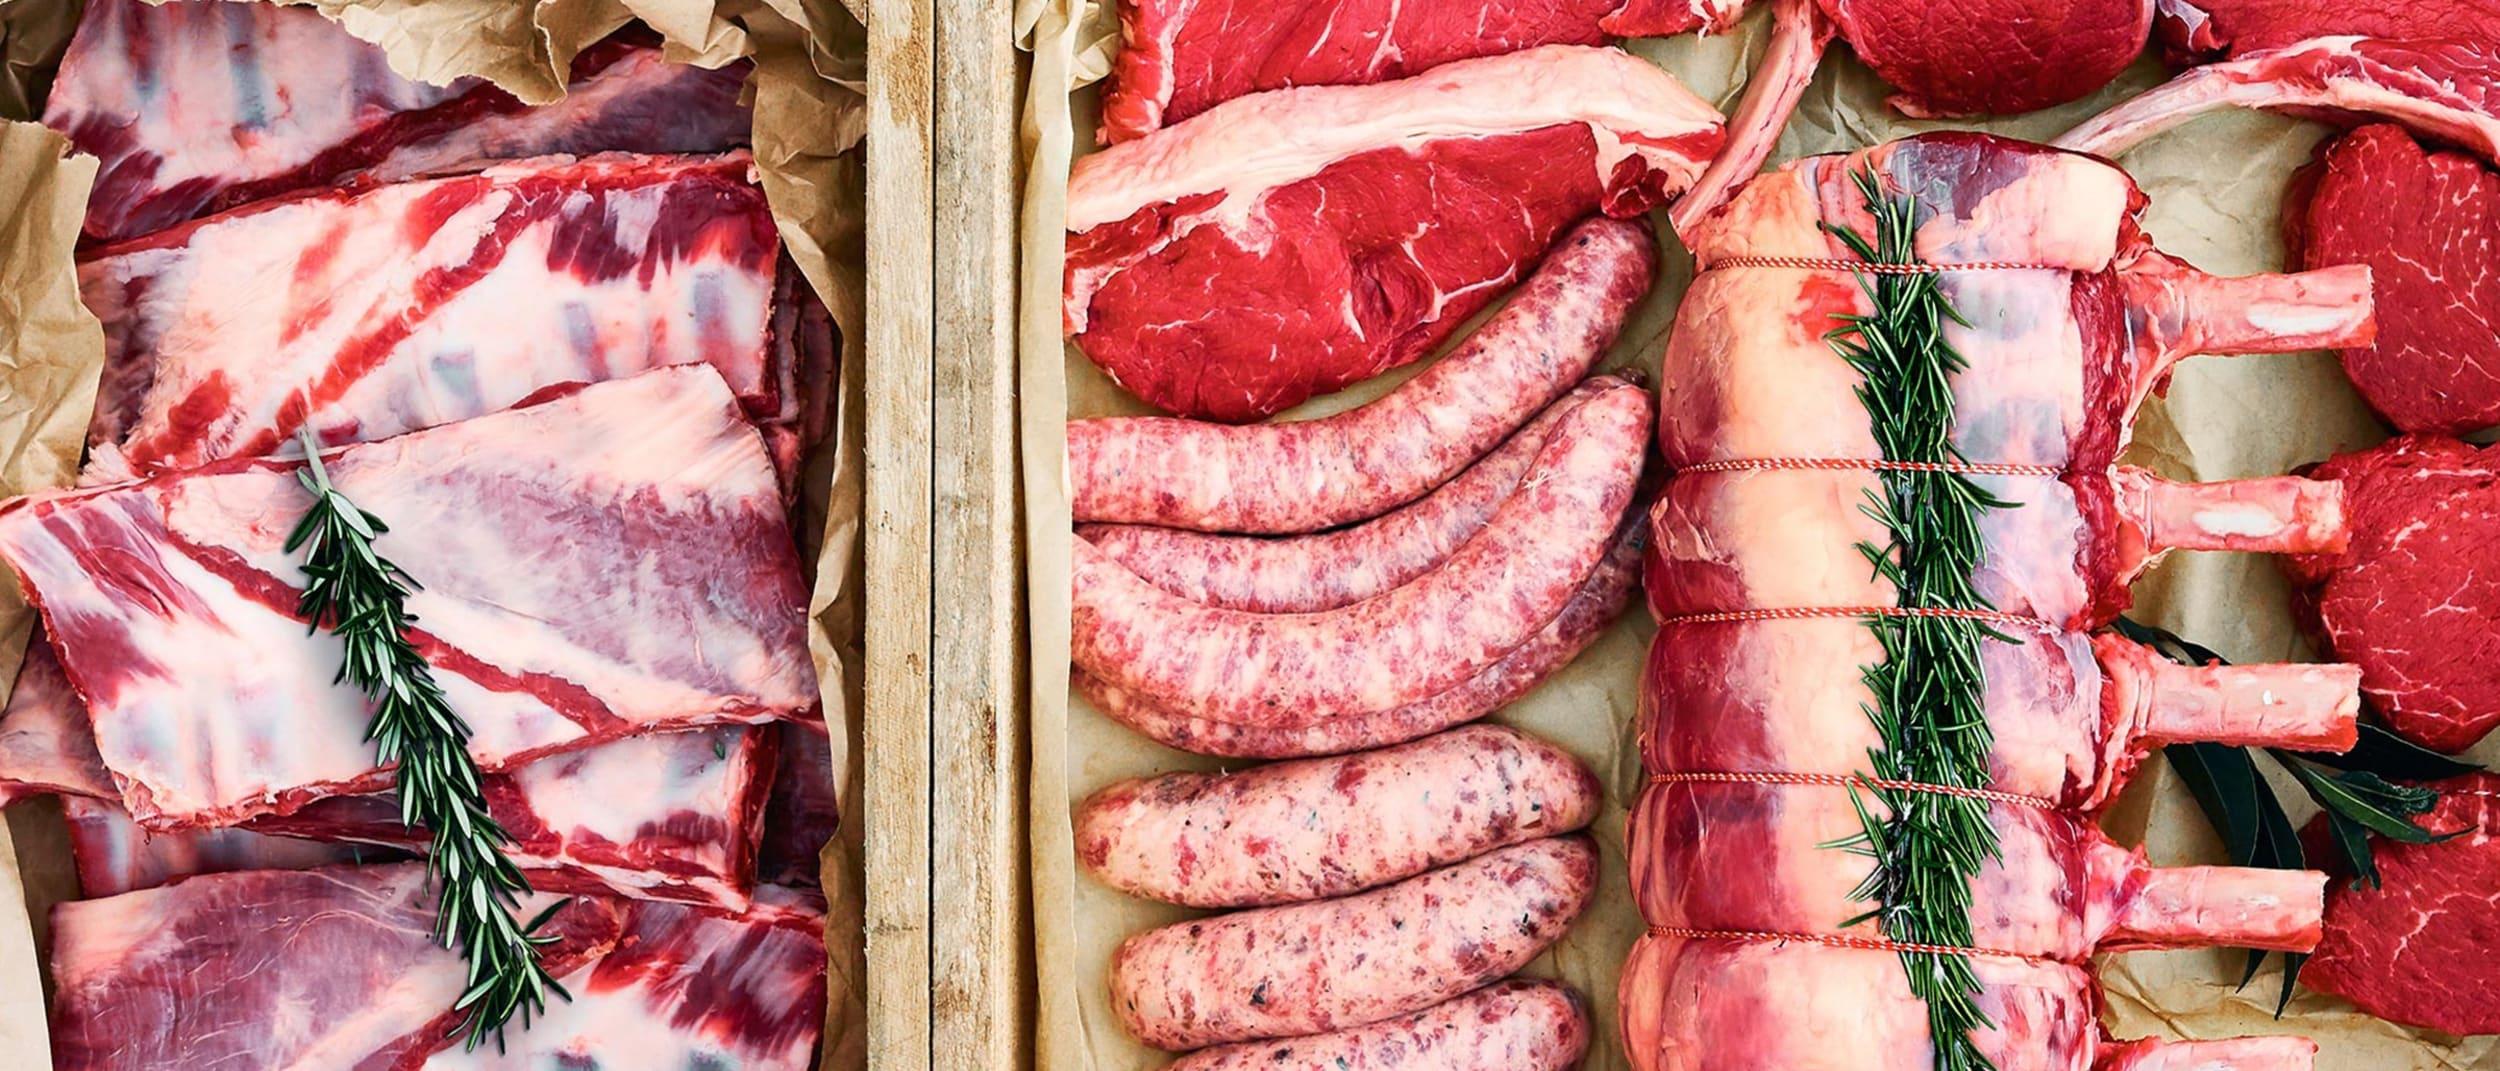 Butcher - Helensvale